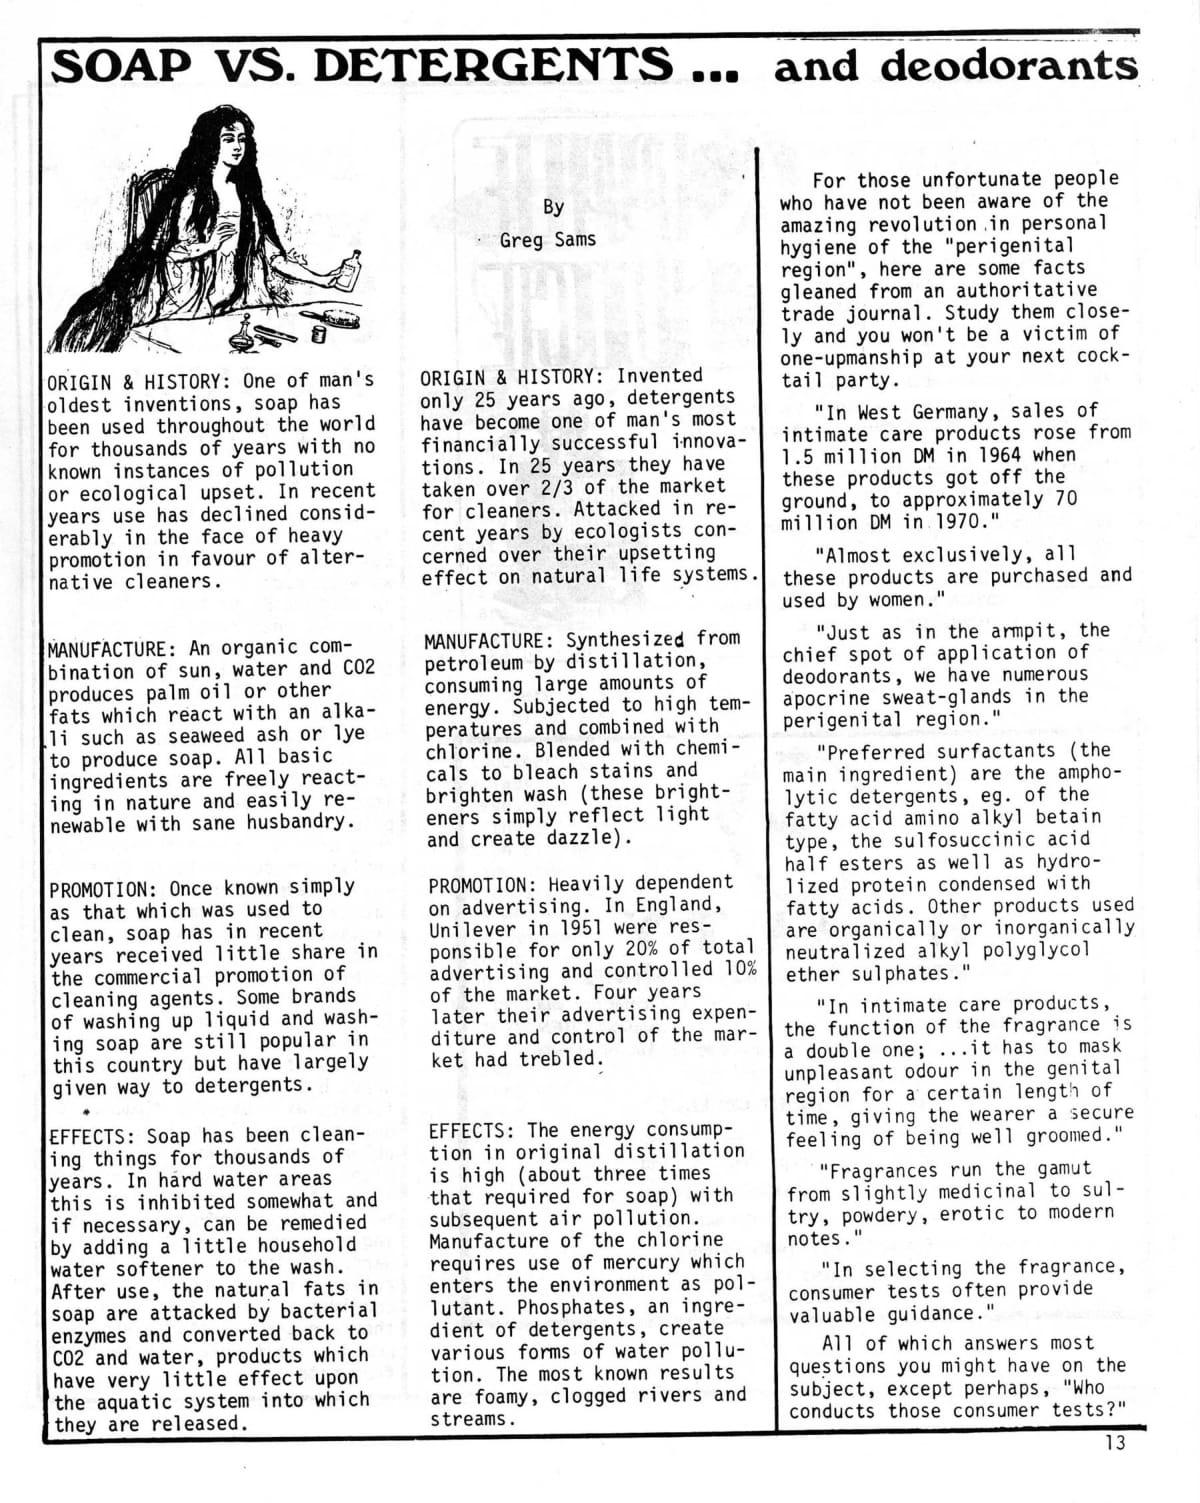 seed-v2-n1-jan1973-13.jpg